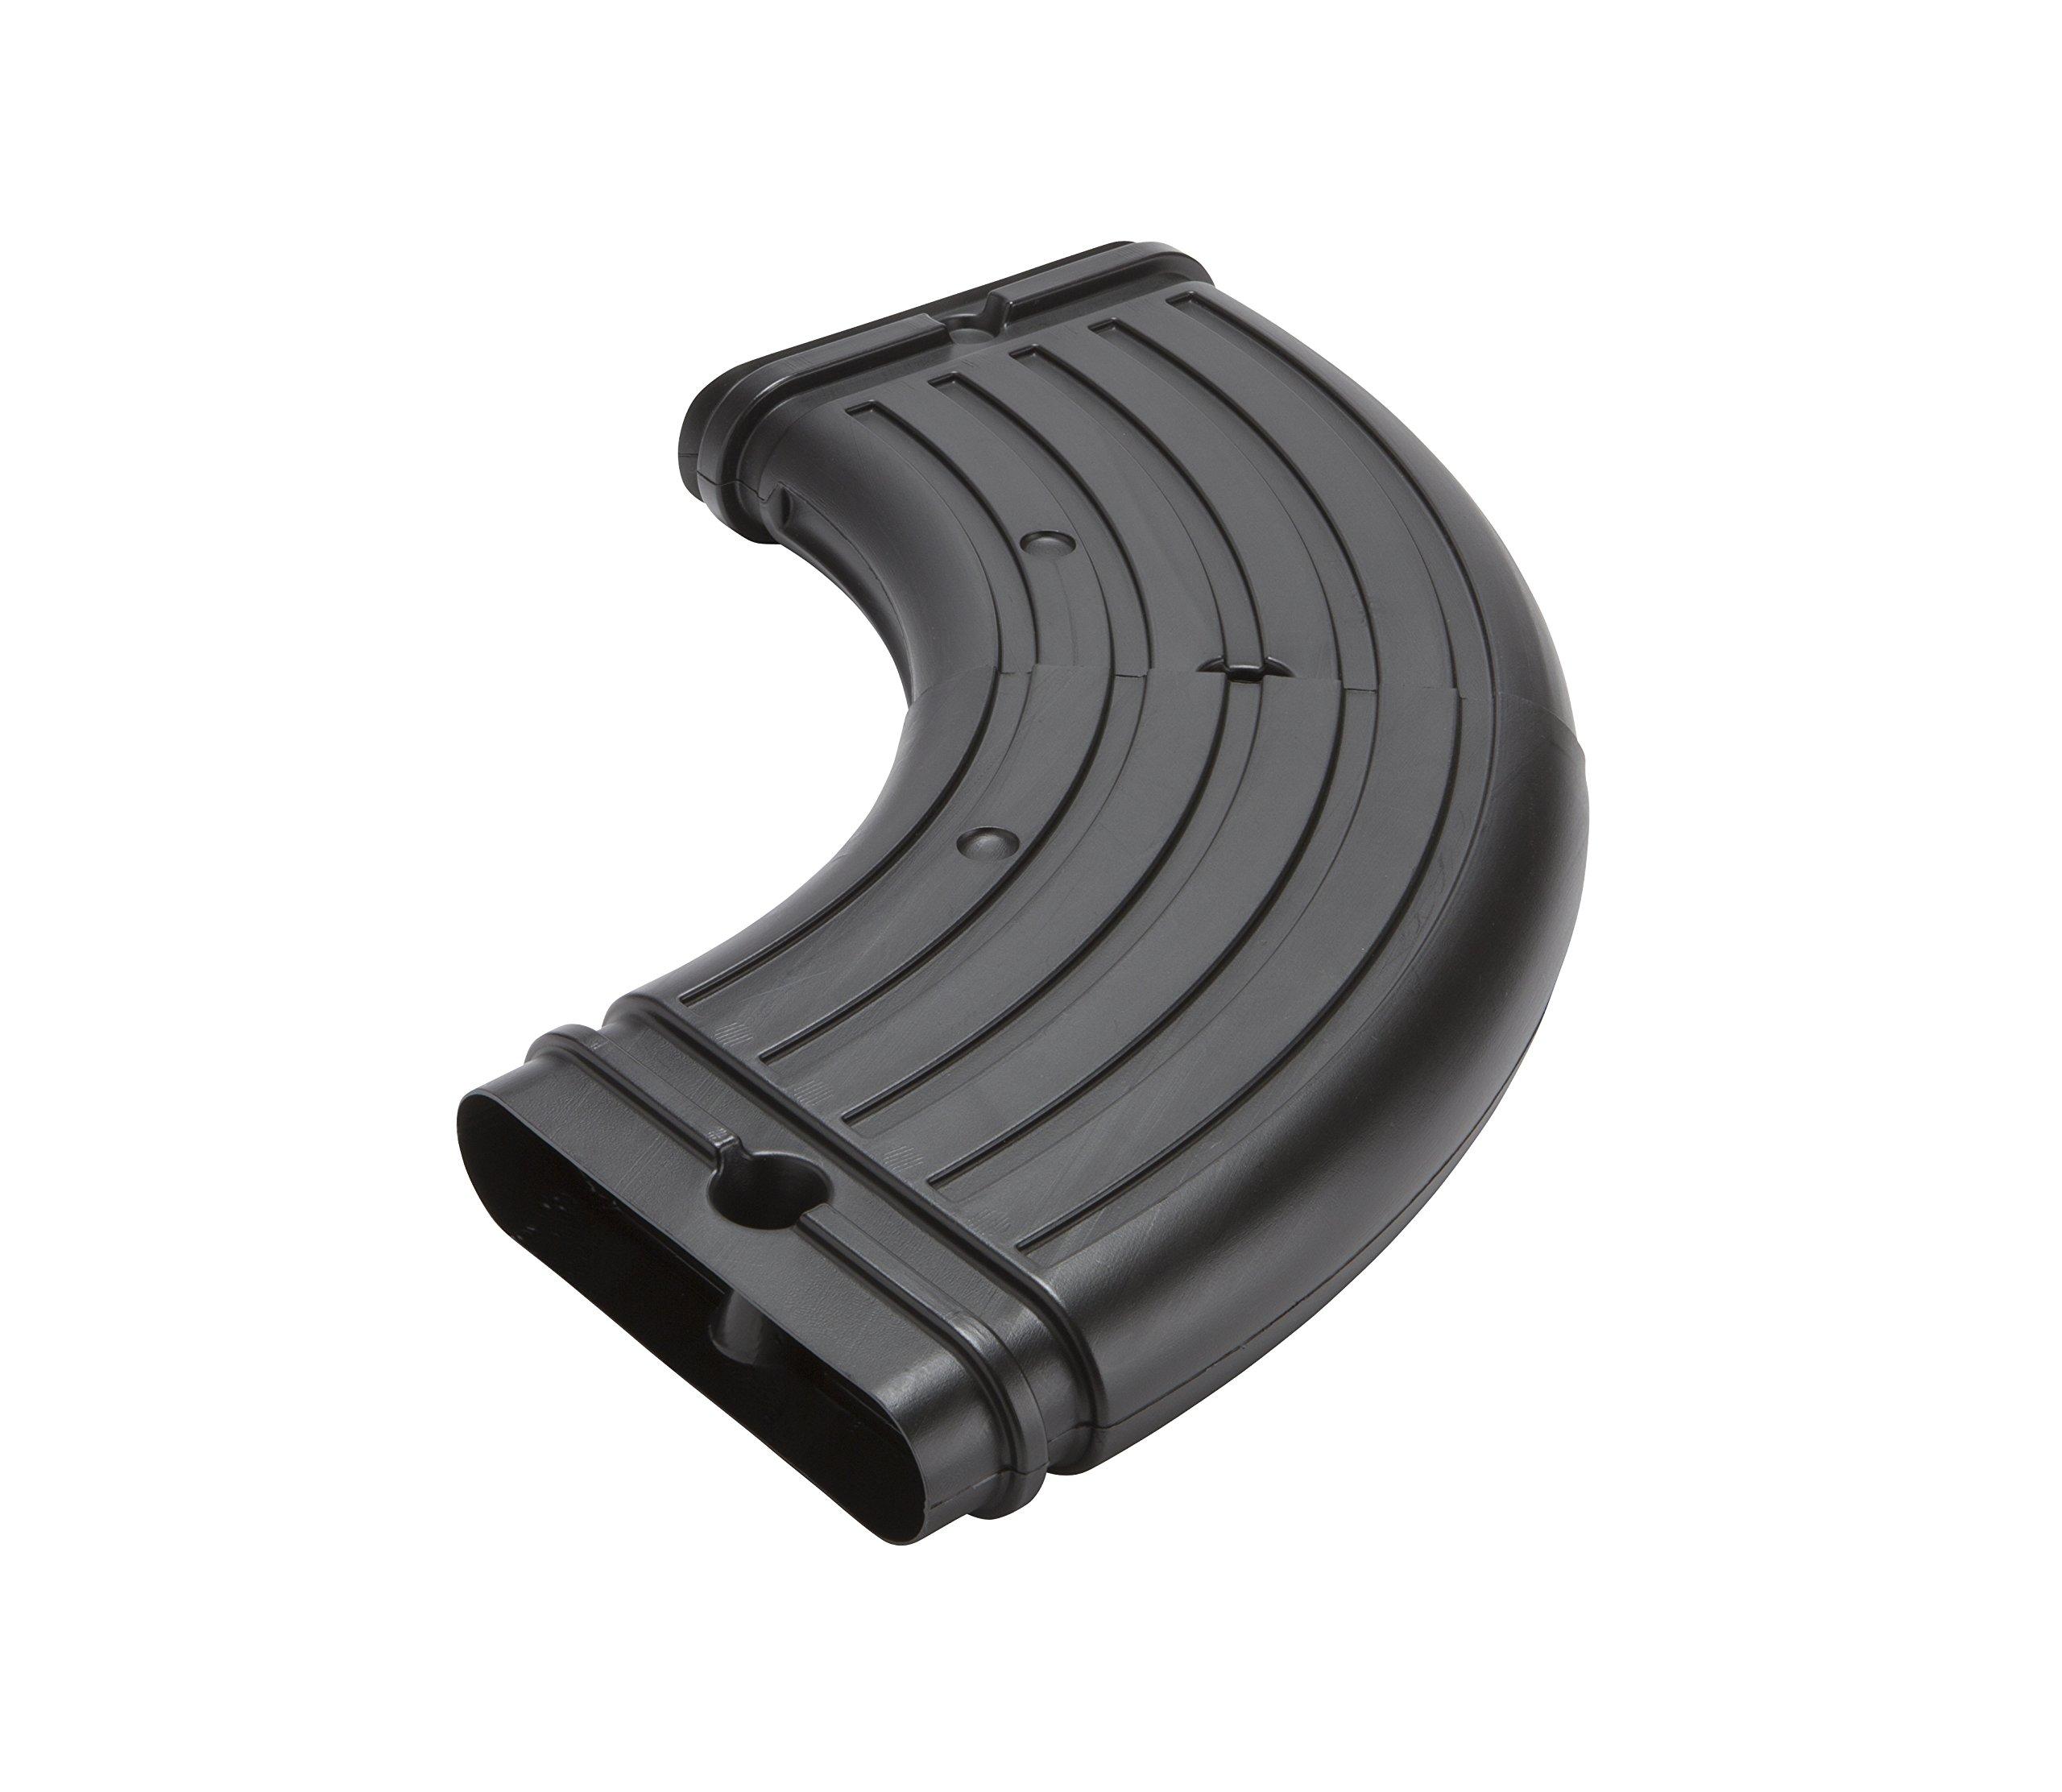 StealthFlow 4631 Adjustable Elbow, Black